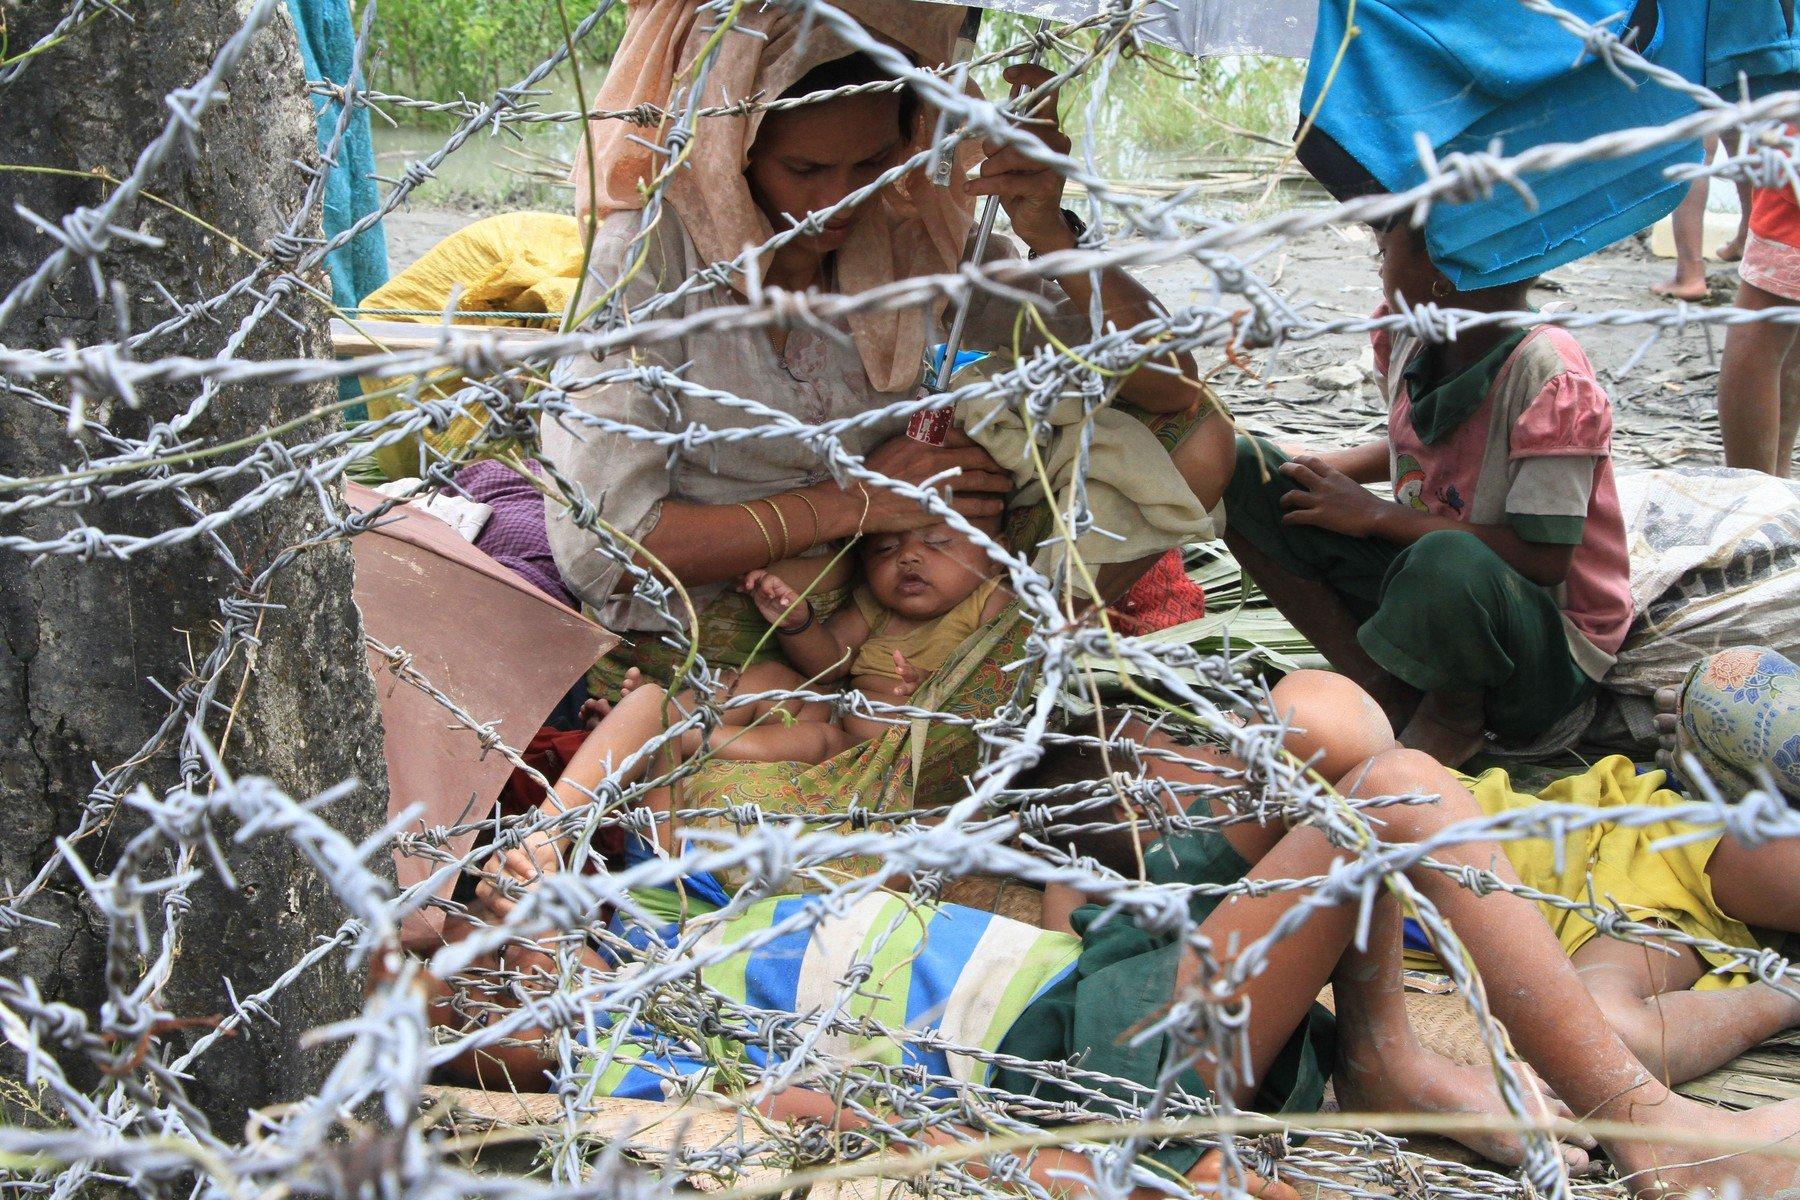 COX'S BAZAR, BANGLADESH - SEPTEMBER 07: Rohingya refugees from Myanmar Rakhine state gather at Myanmar-Bangladesh border on September 7, 2017 in Cox's Bazar, Bangladesh., Image: 348609406, License: Rights-managed, Restrictions: , Model Release: no, Credit line: Profimedia, Barcroft Media